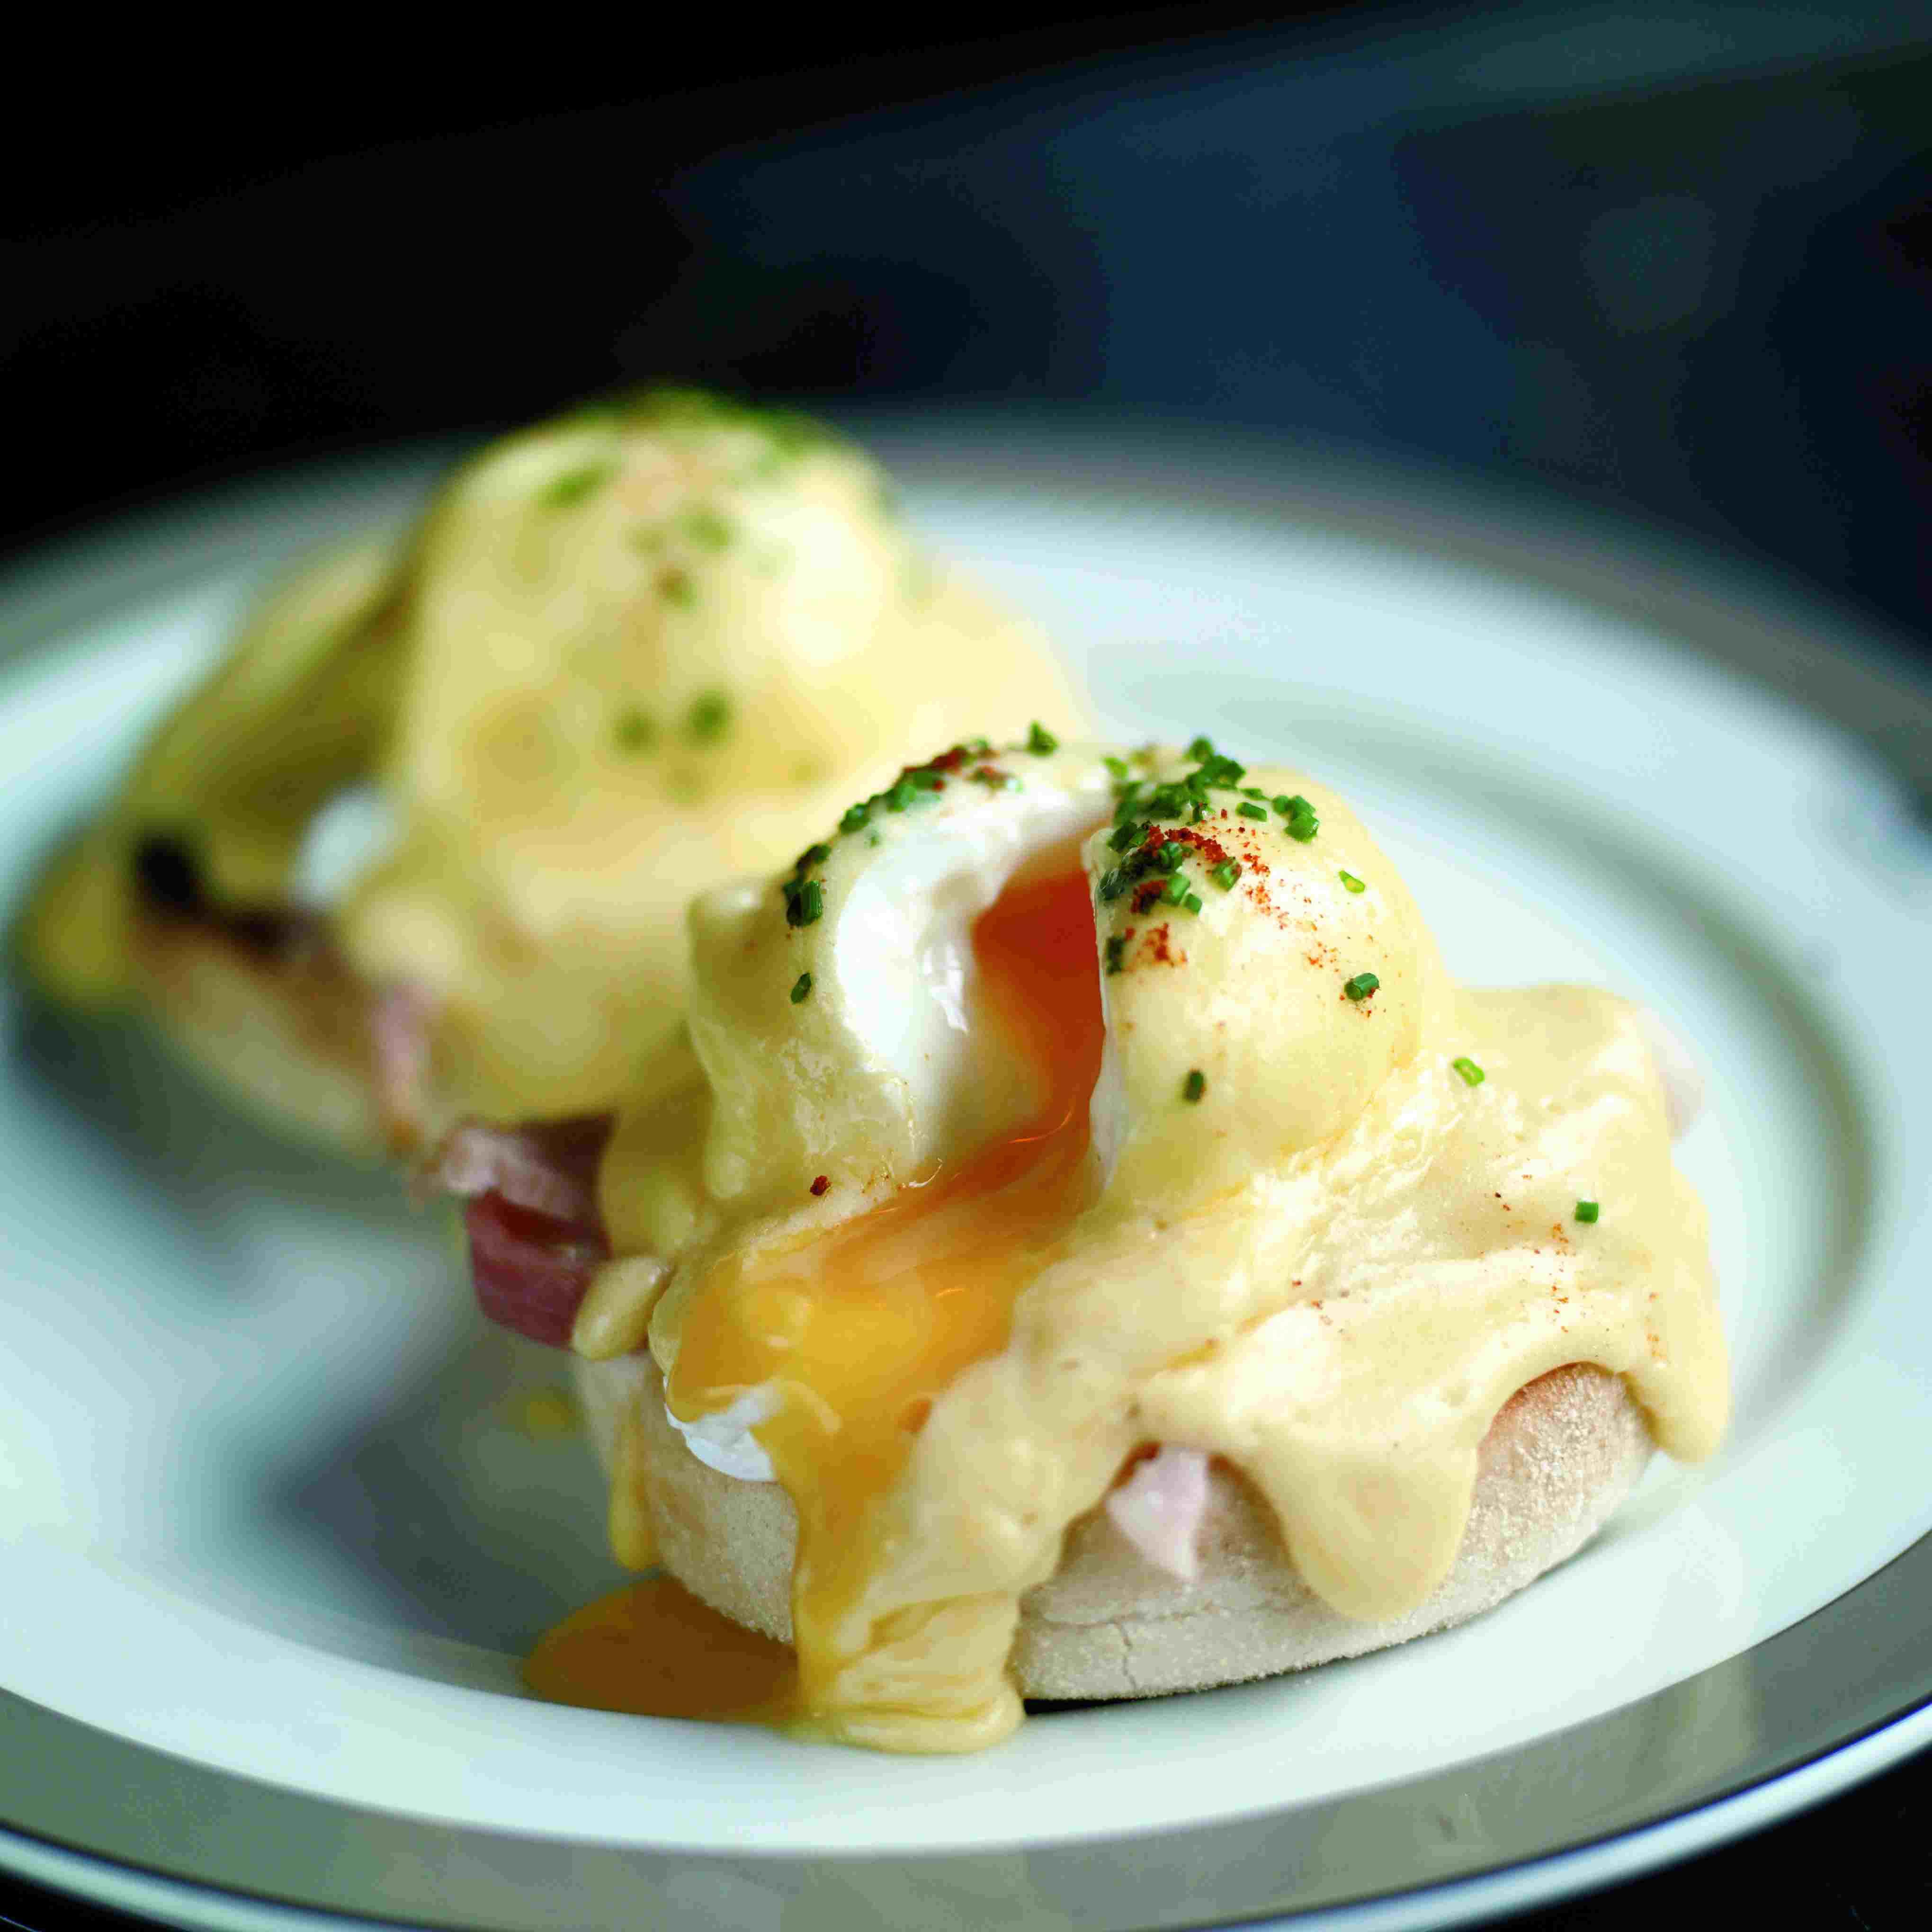 The Wolseley Eggs Benedict